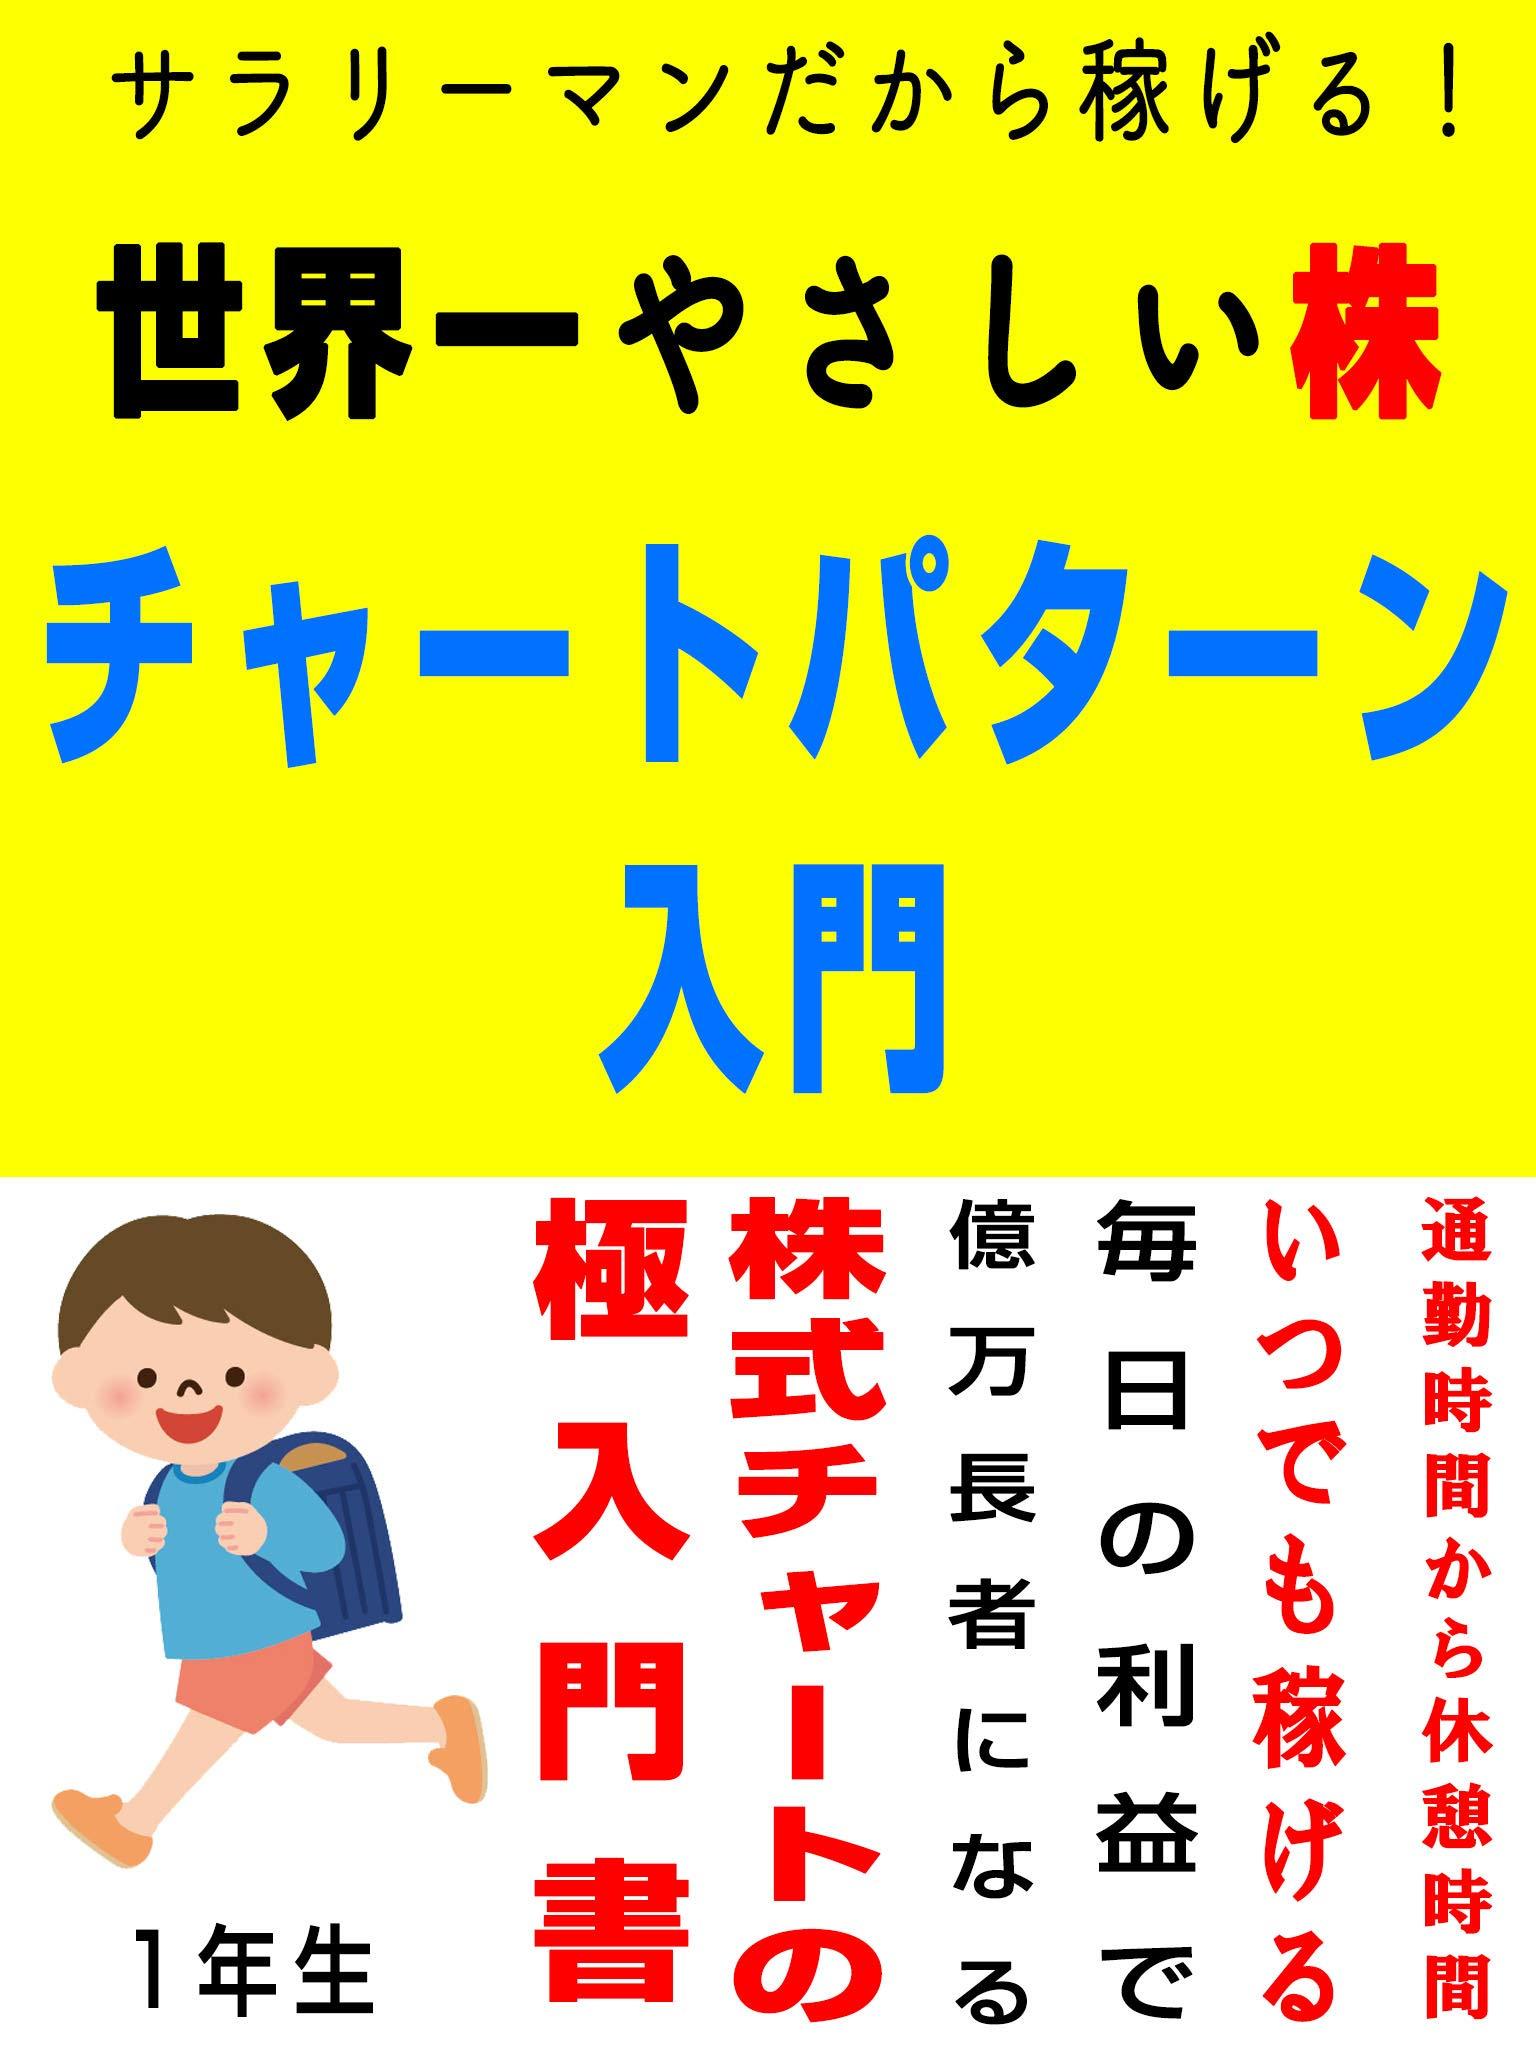 sekaiichiyasashikabucha-topata-nnyumon (Japanese Edition)